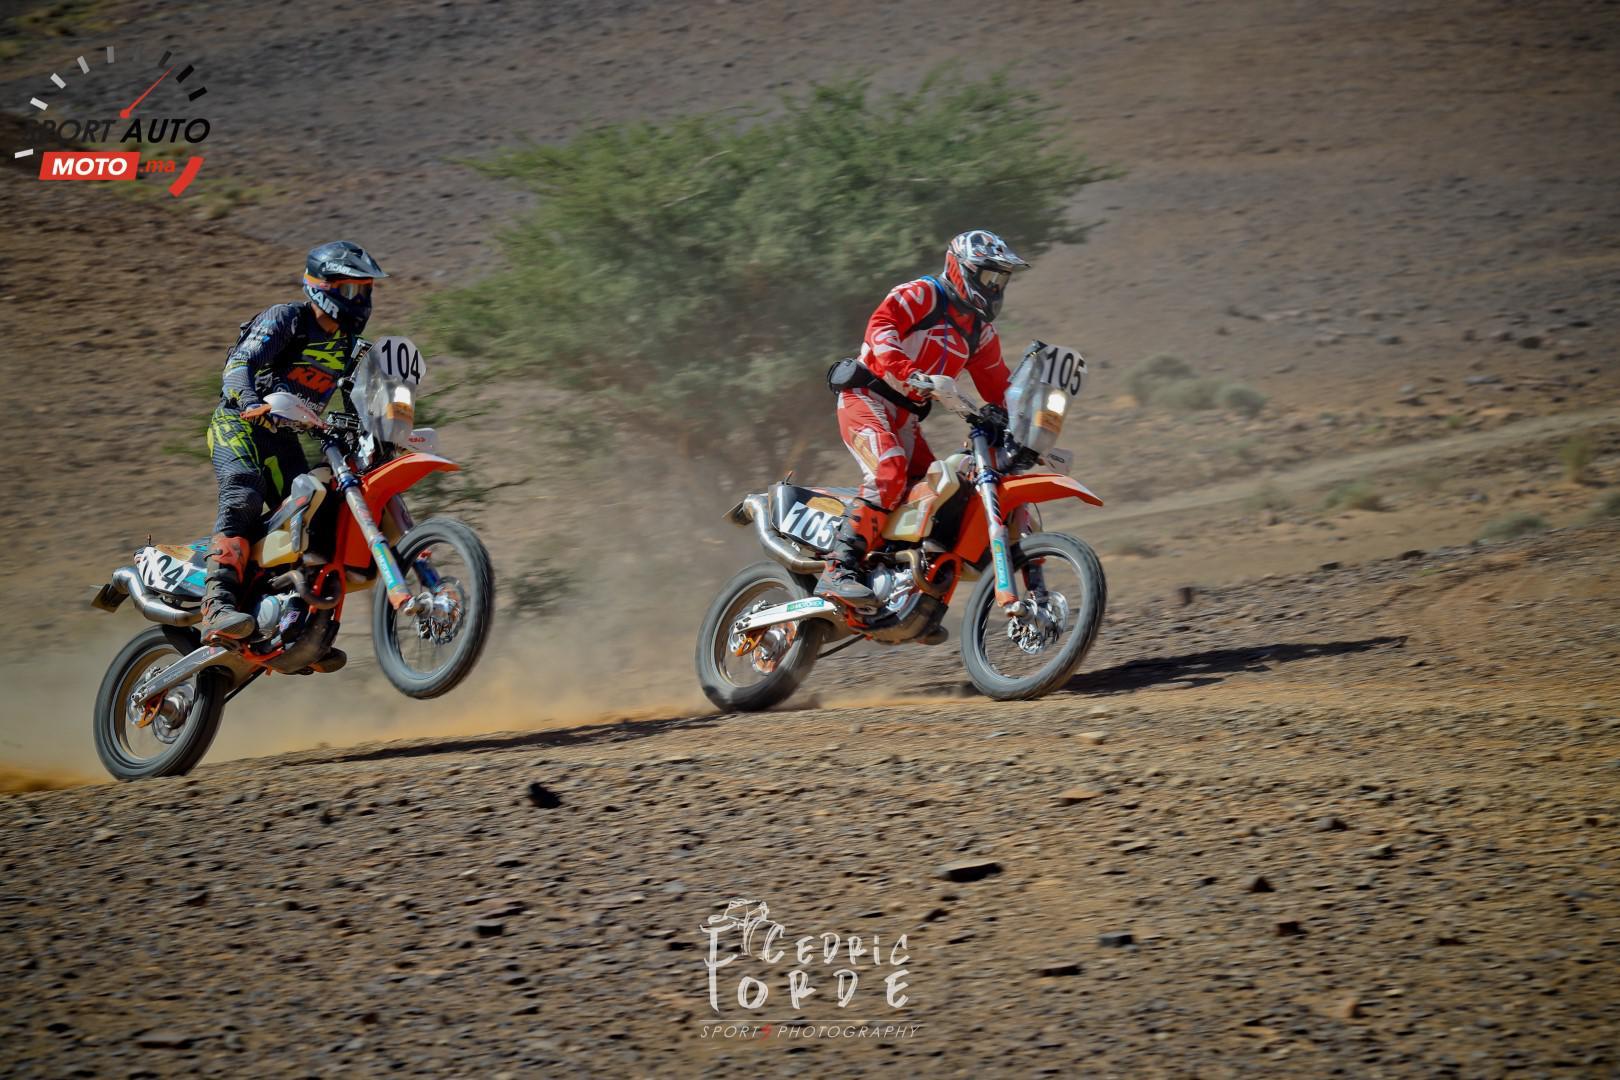 hearts-of-morocco-2018-zapletal-et-svitko-vainqueur-du-jour-895-6.jpg